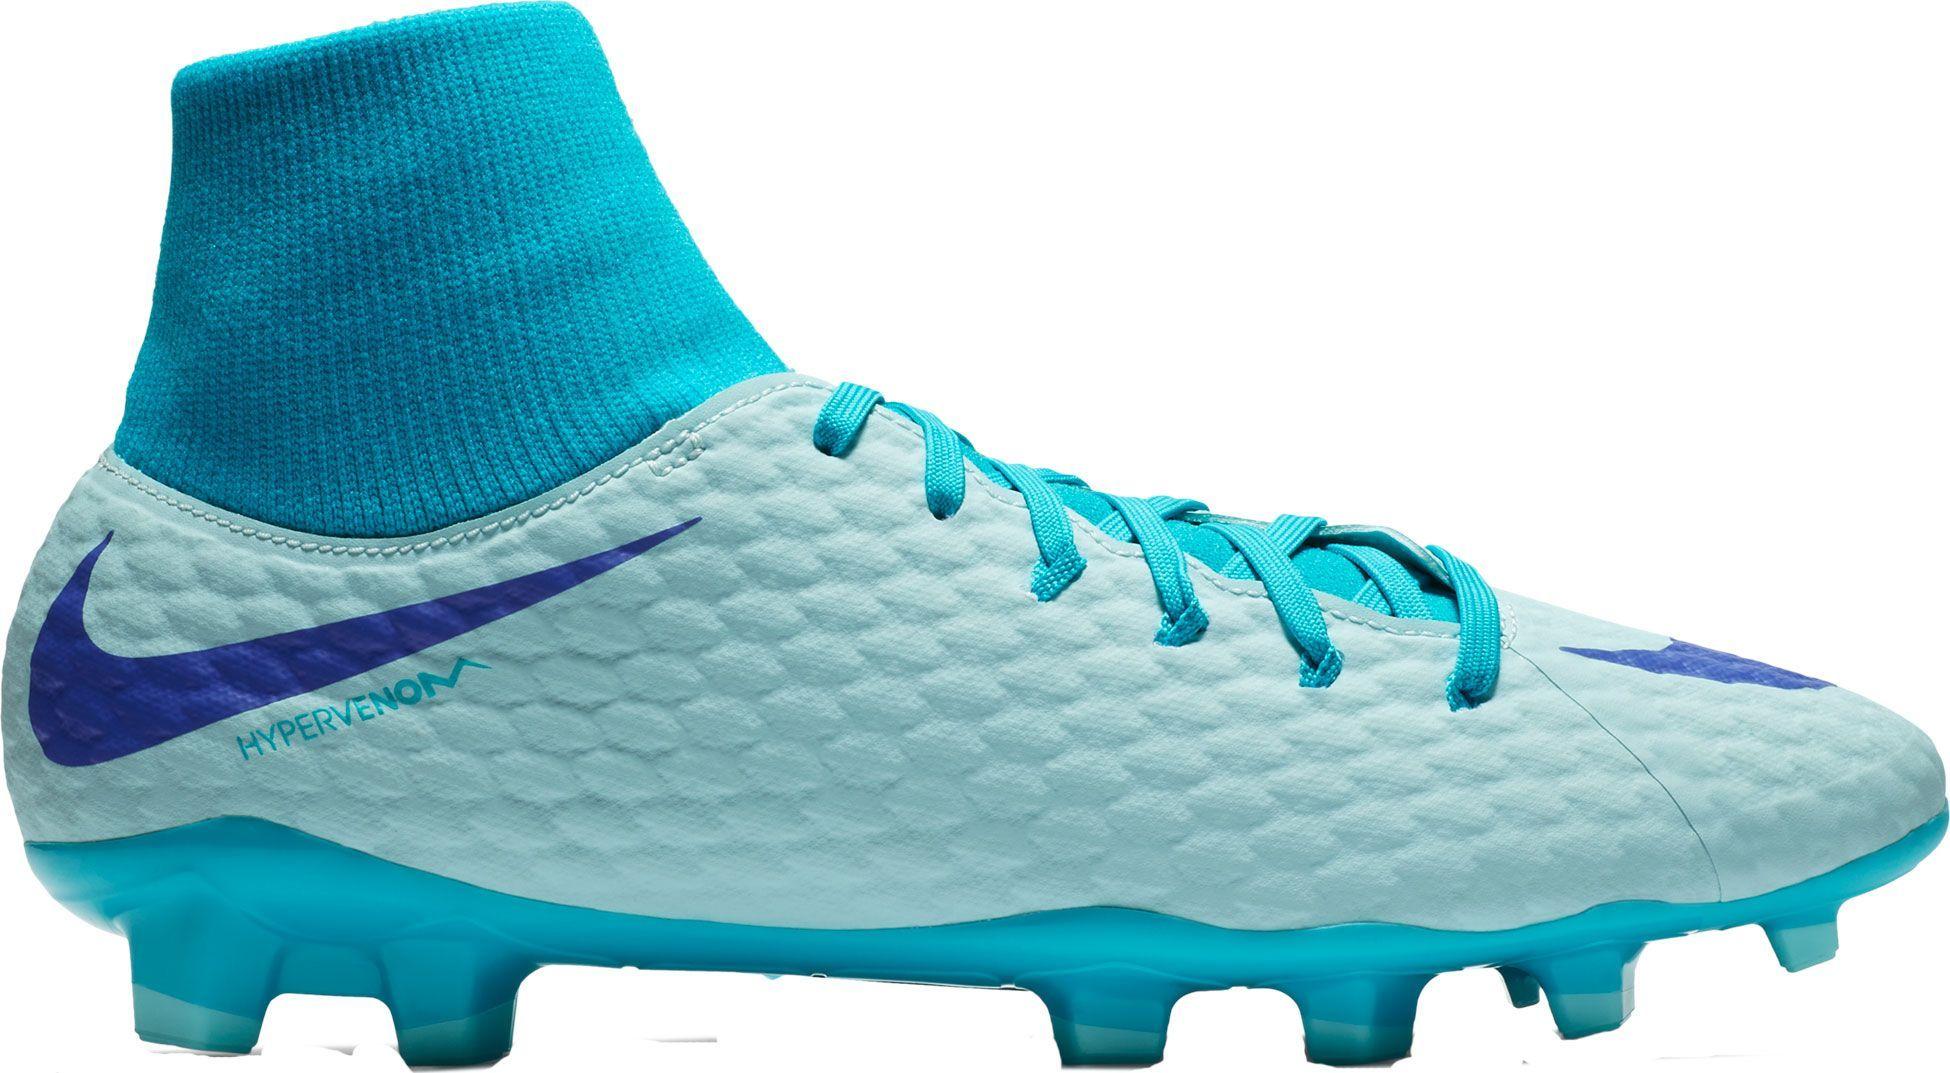 c0d97ce9a84b Nike Hypervenom Phantom 3 Academy Dynamic Fit FG Soccer Cleats, Women's,  Size: M9.5/W11, Blue